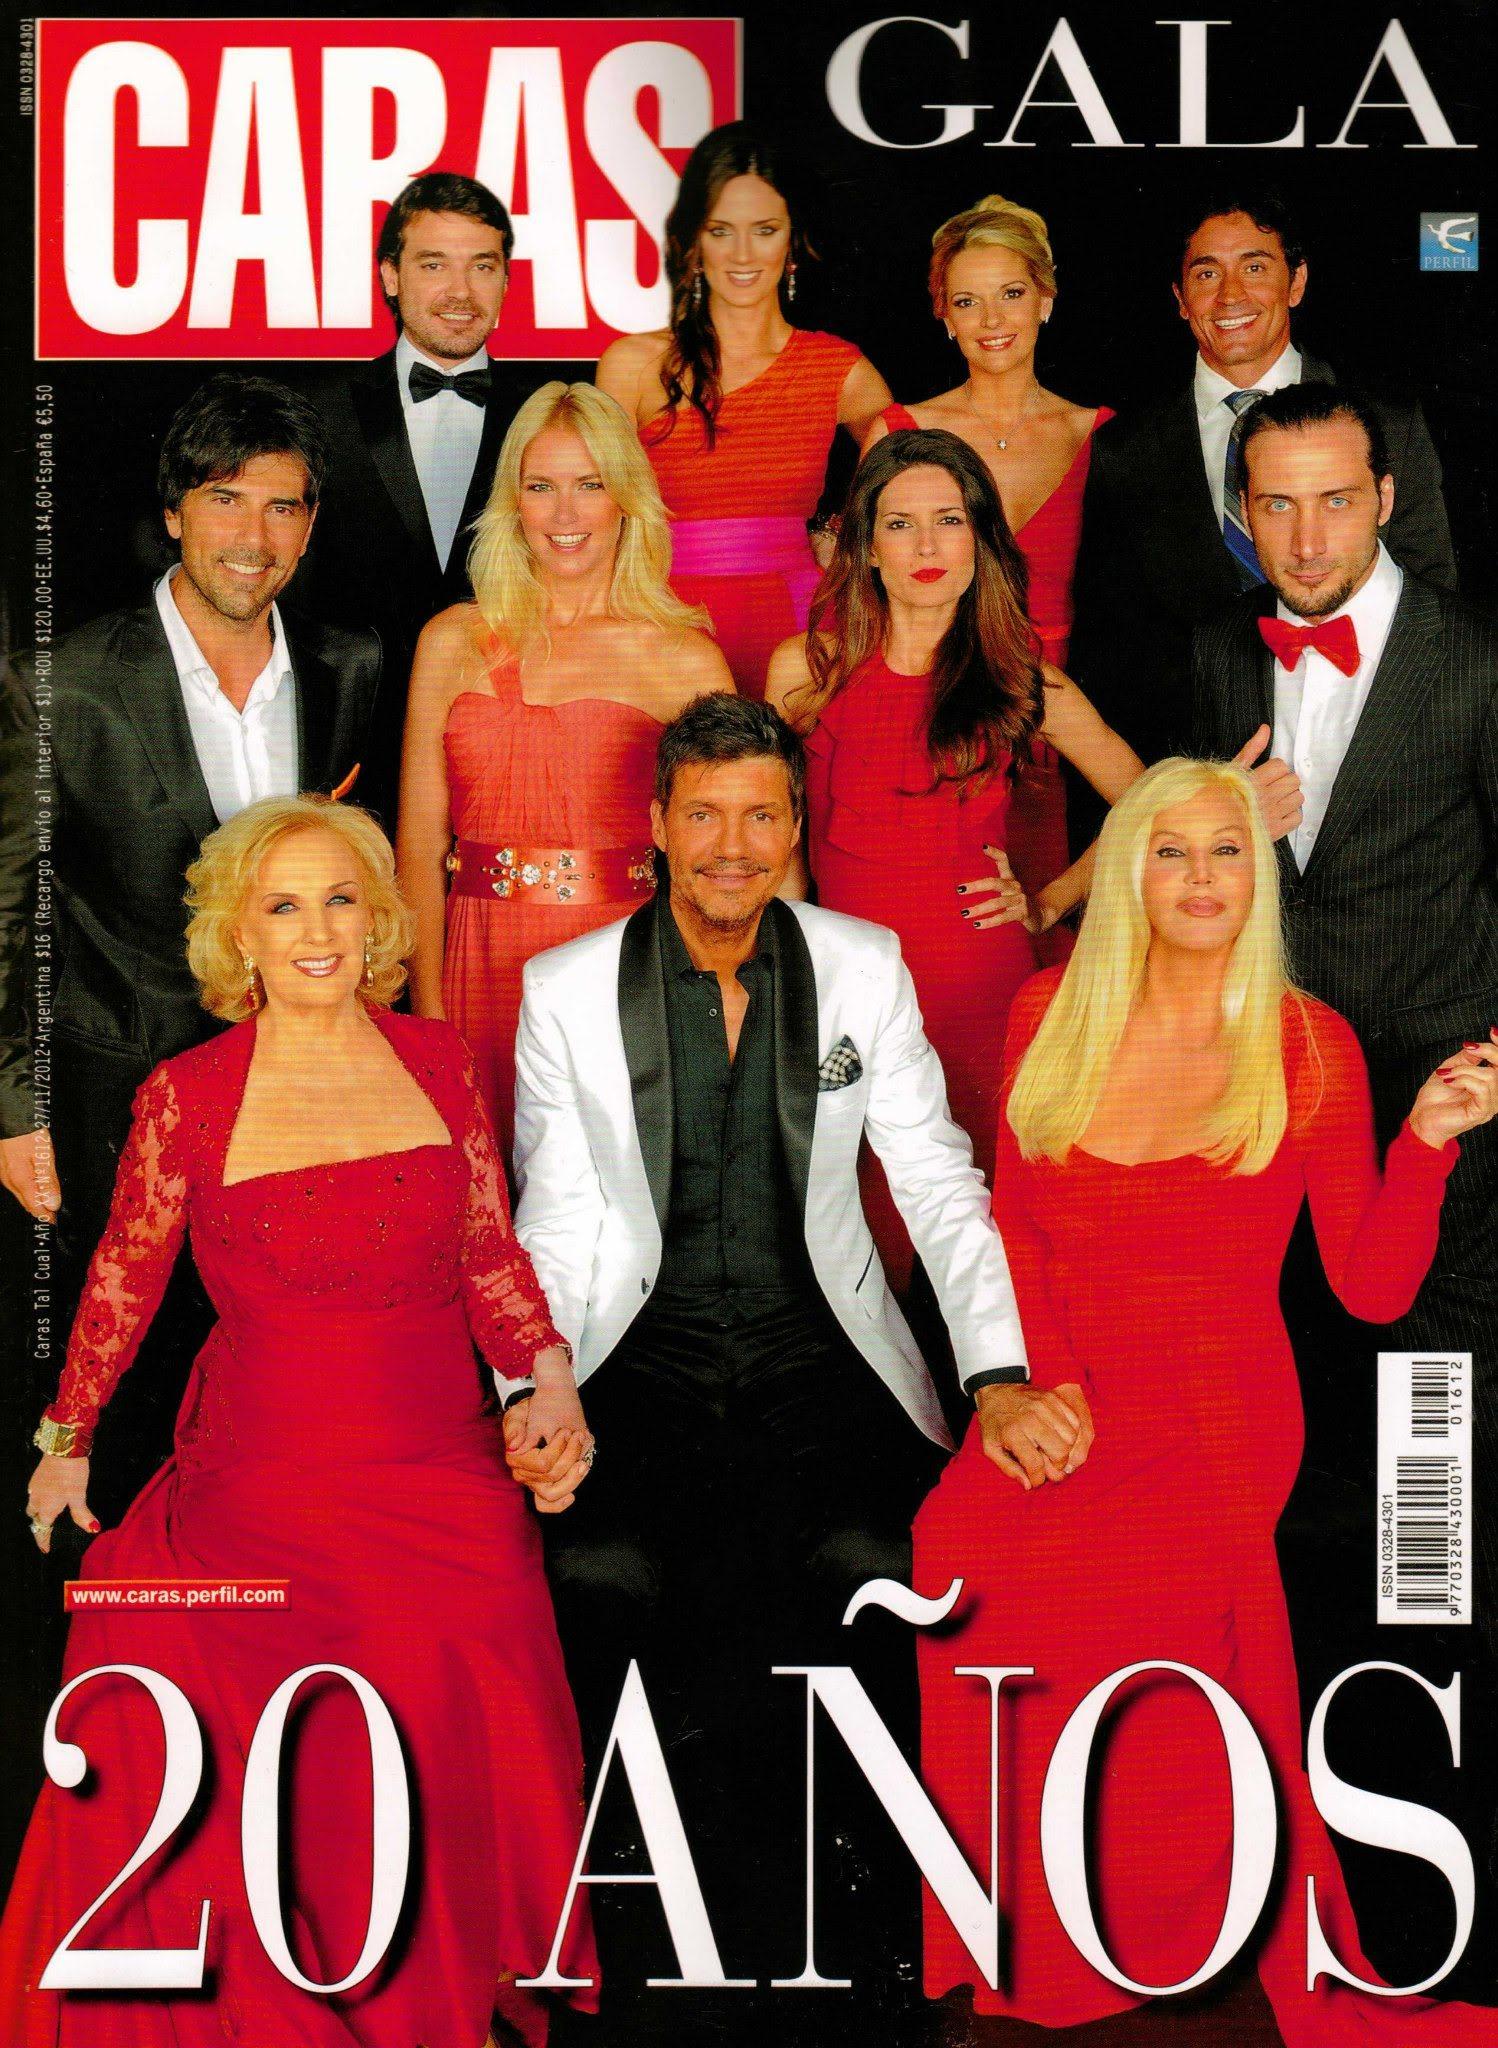 Аргентинские теленовеллы 2012 - Página 13 K47KHmoTIx